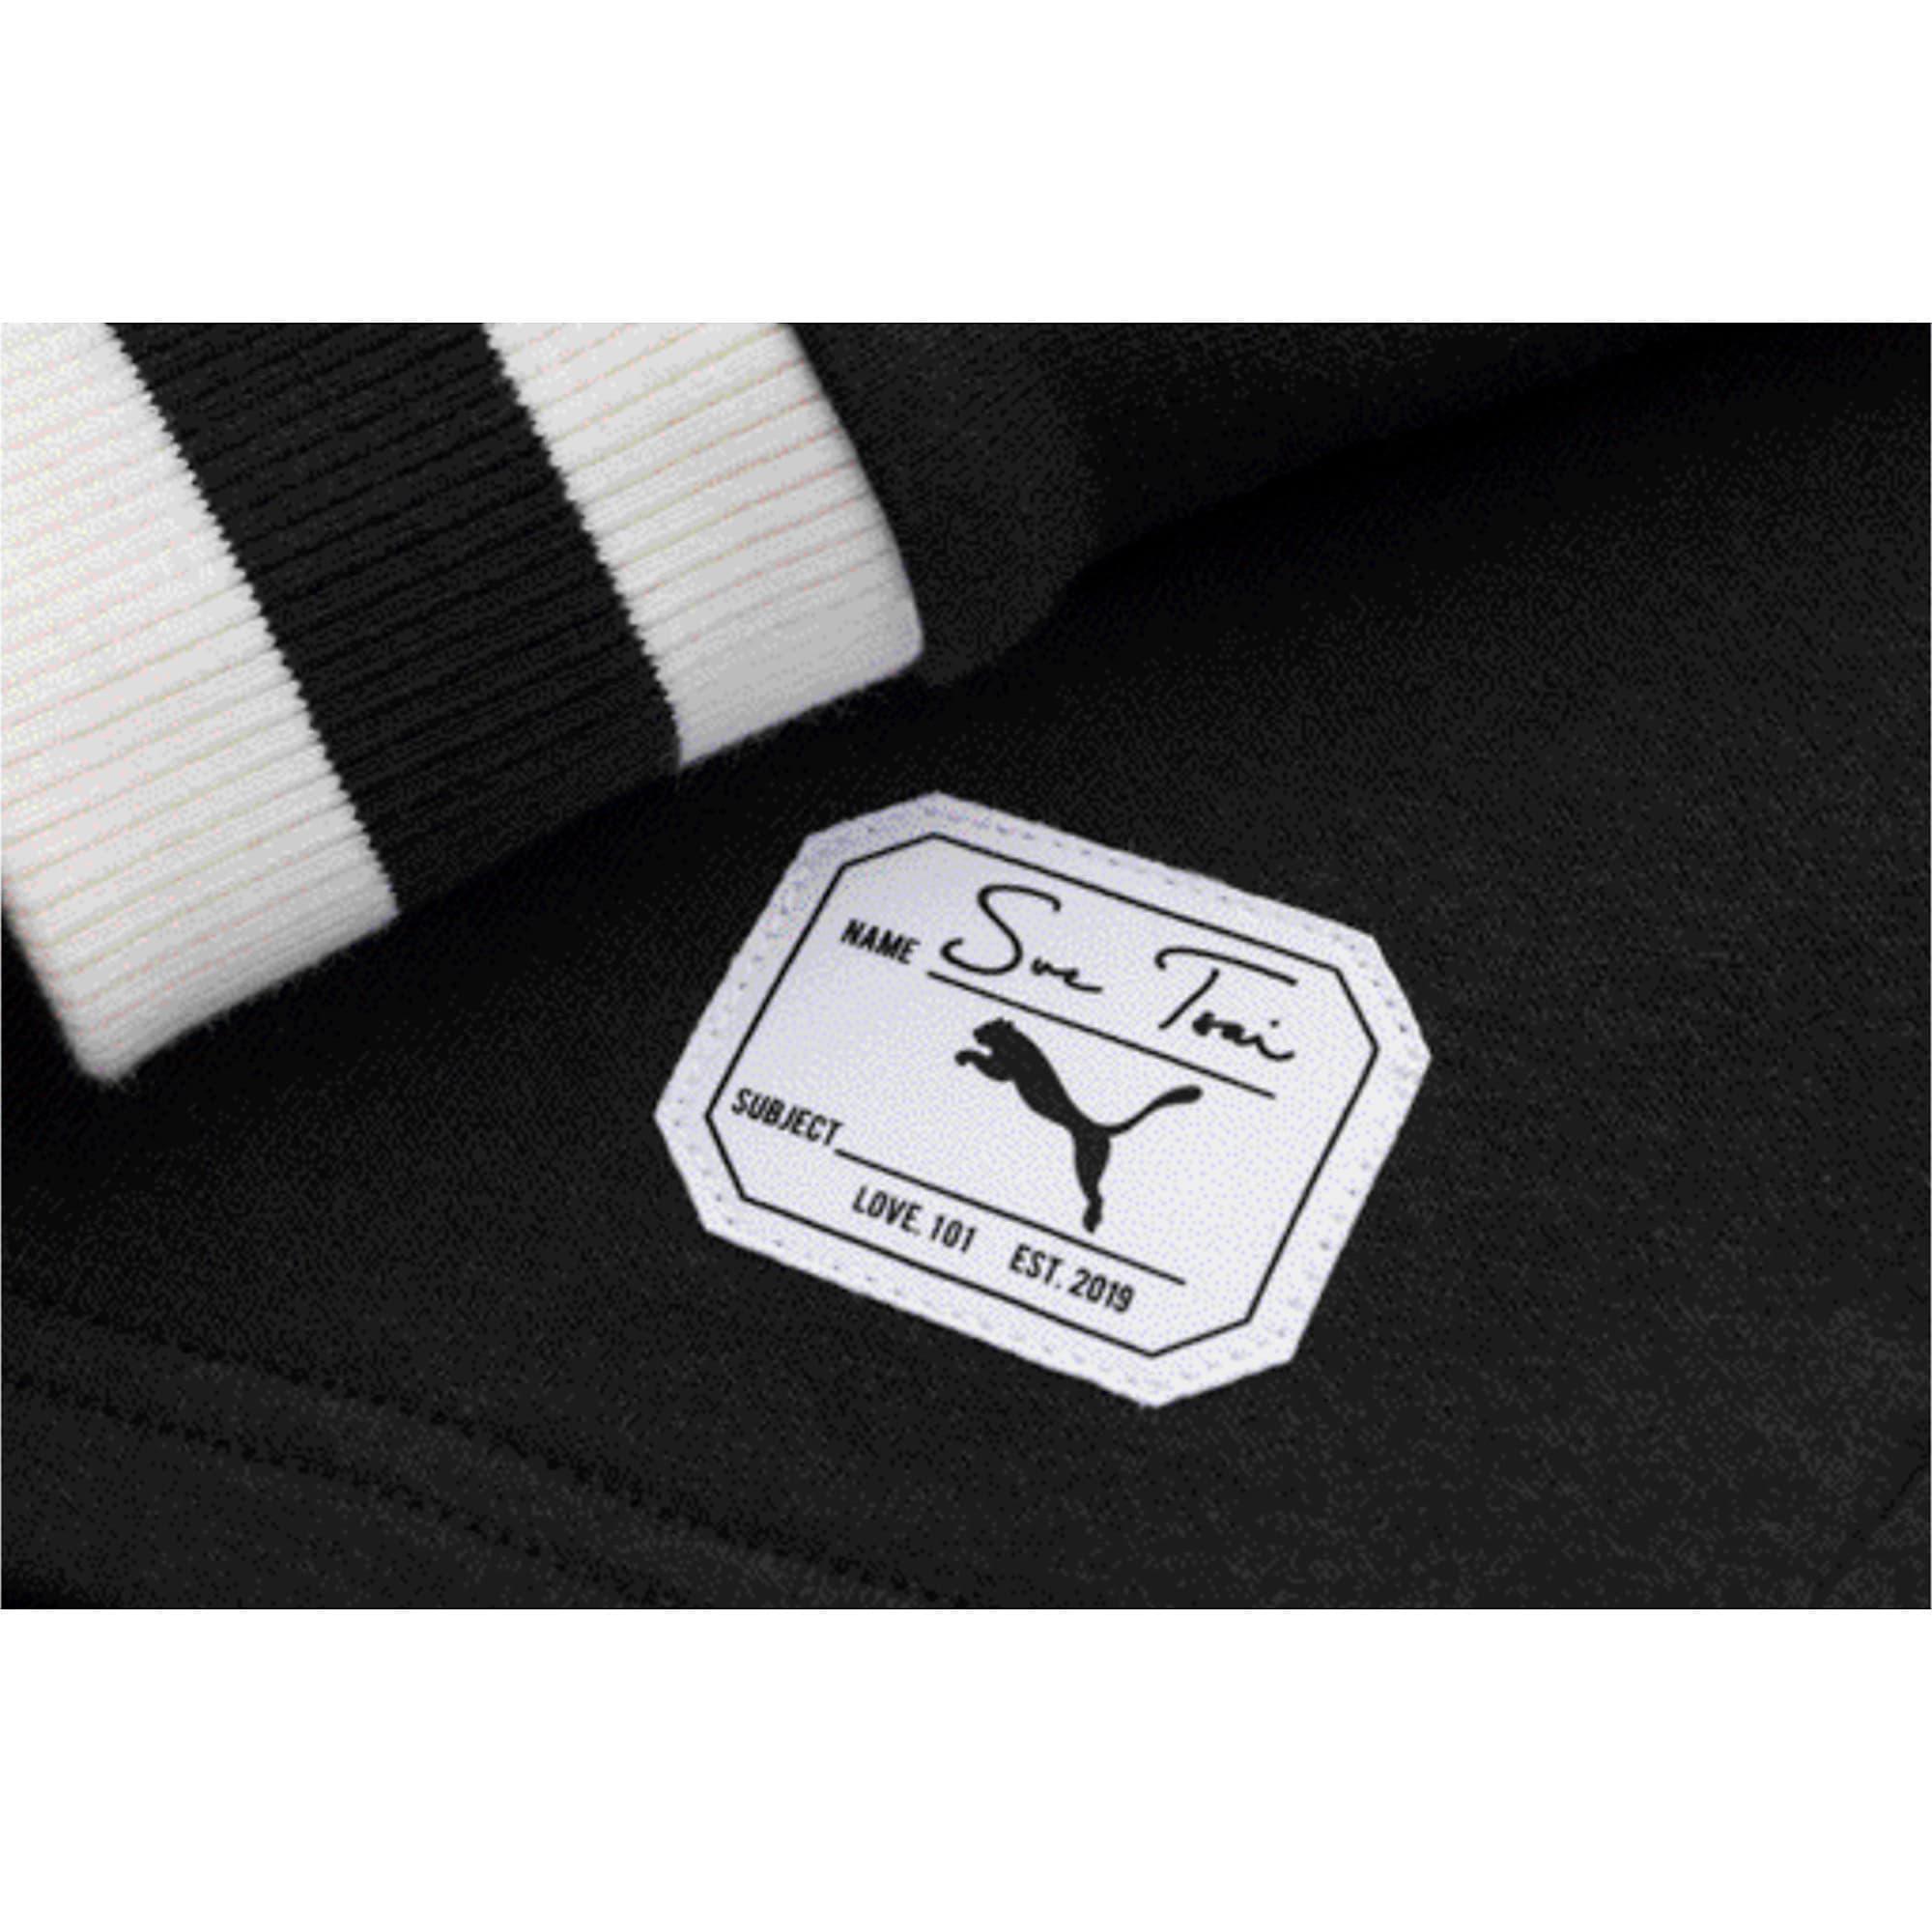 Thumbnail 8 of PUMA x SUE TSAI ウィメンズ Vネック セーター, Puma Black, medium-JPN